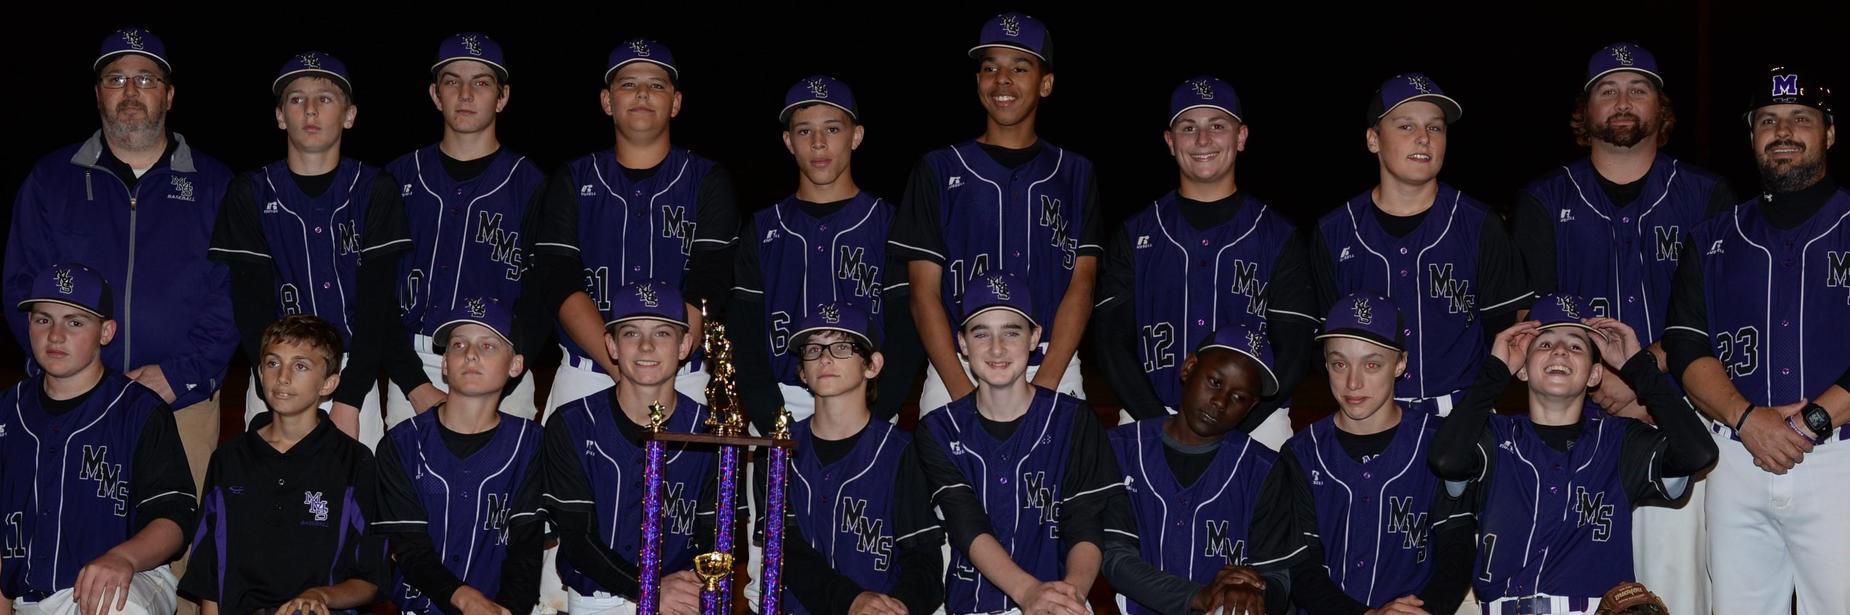 mms baseball team